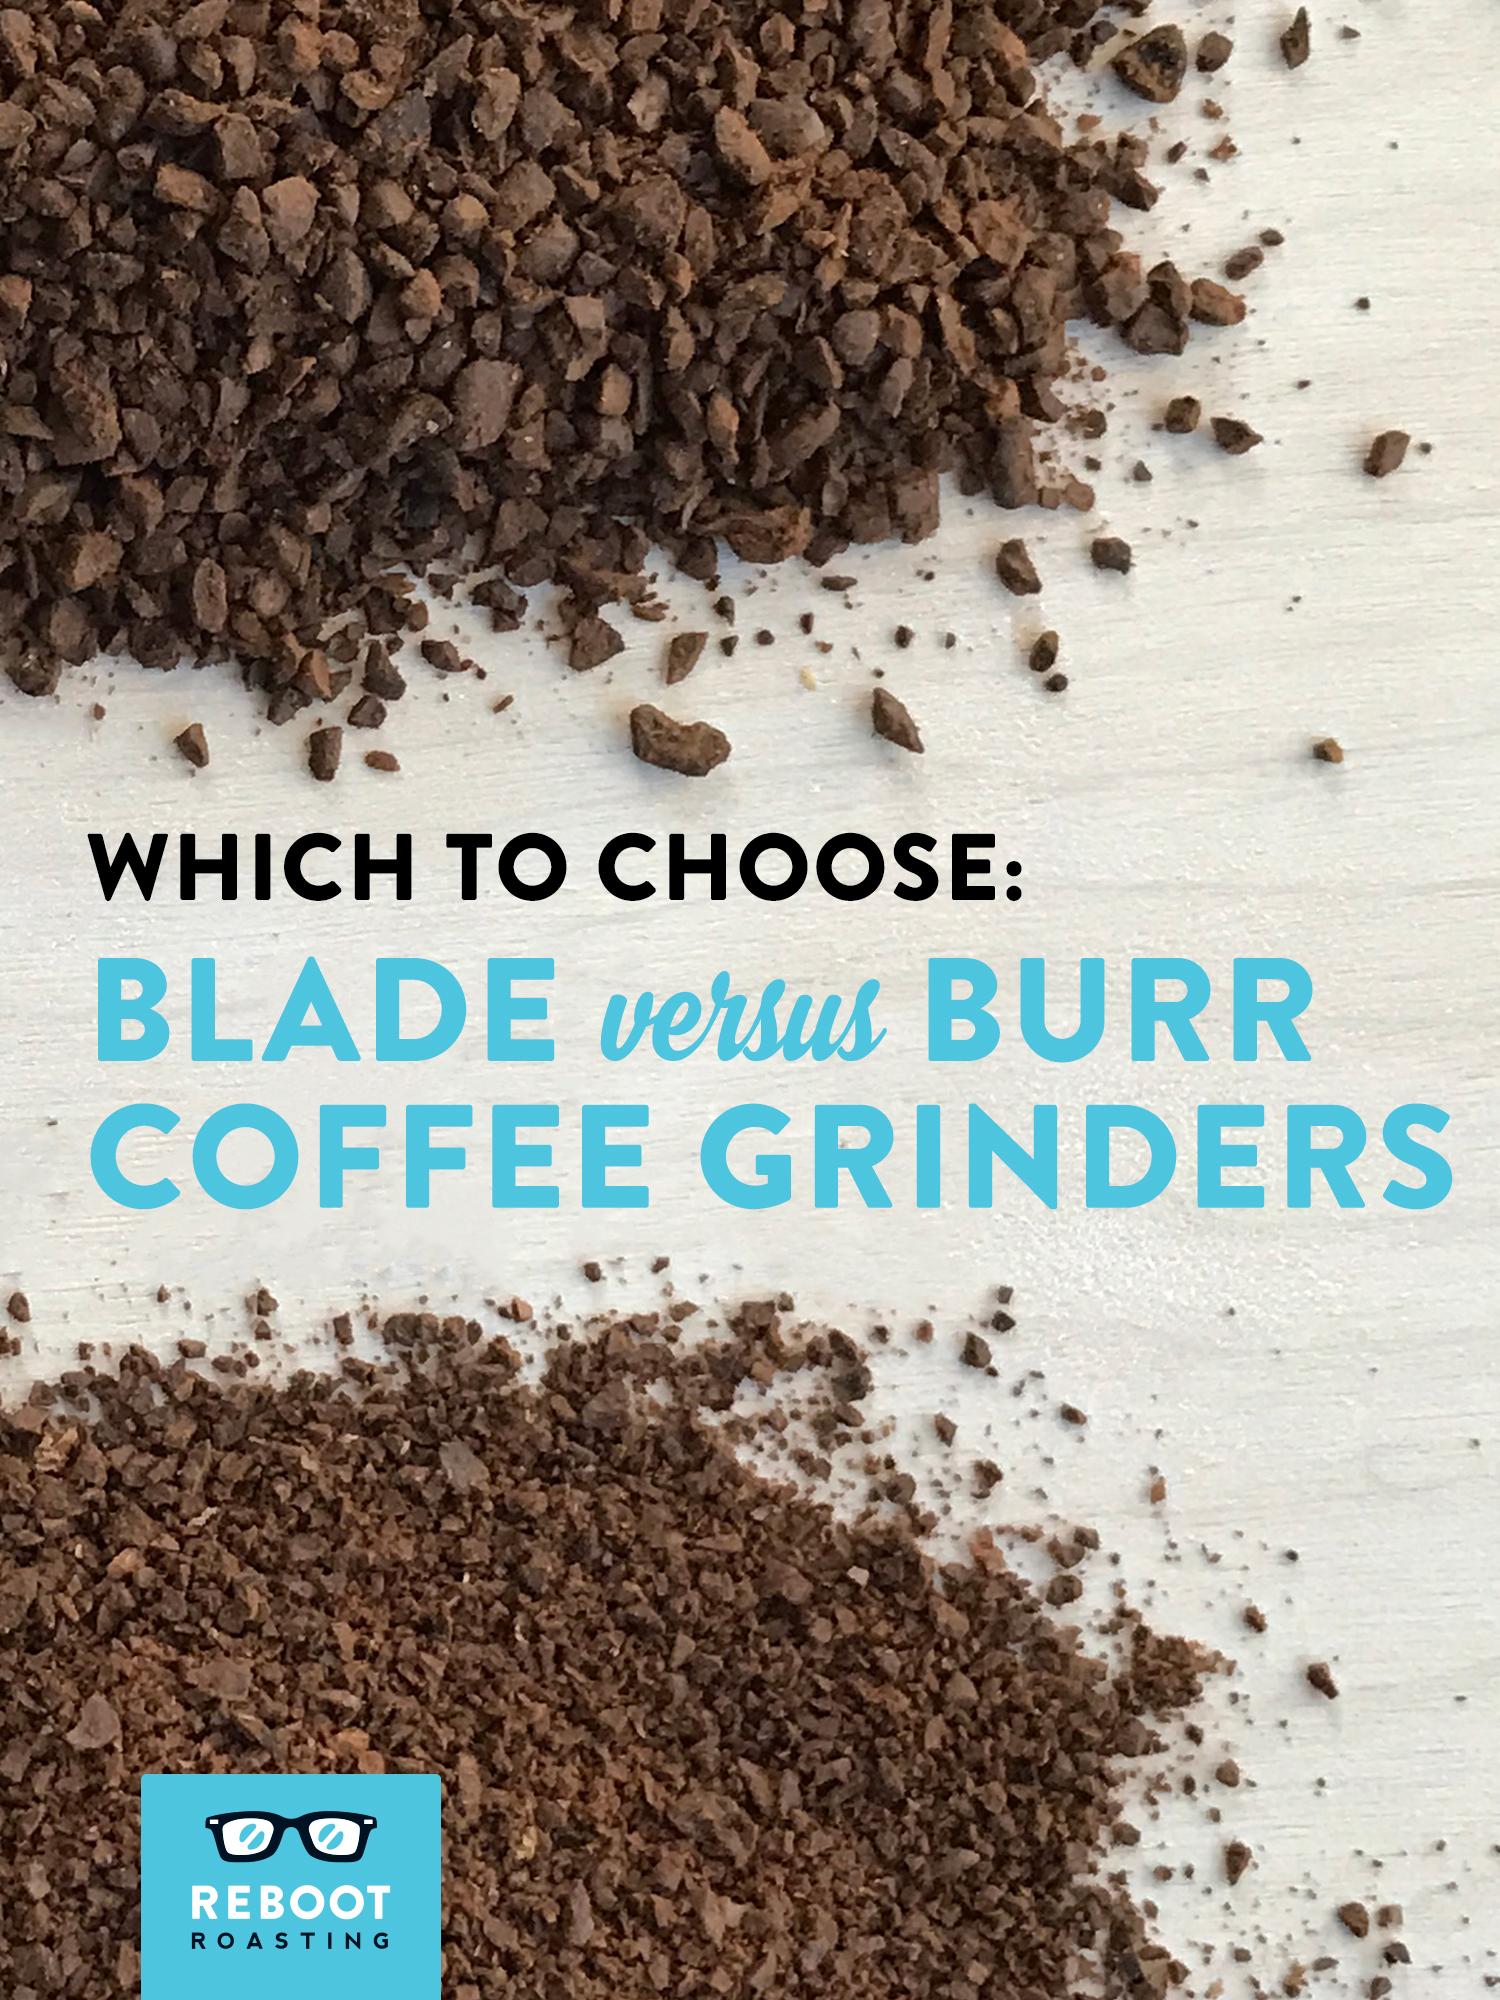 Which to choose: Blade versus burr coffee grinders